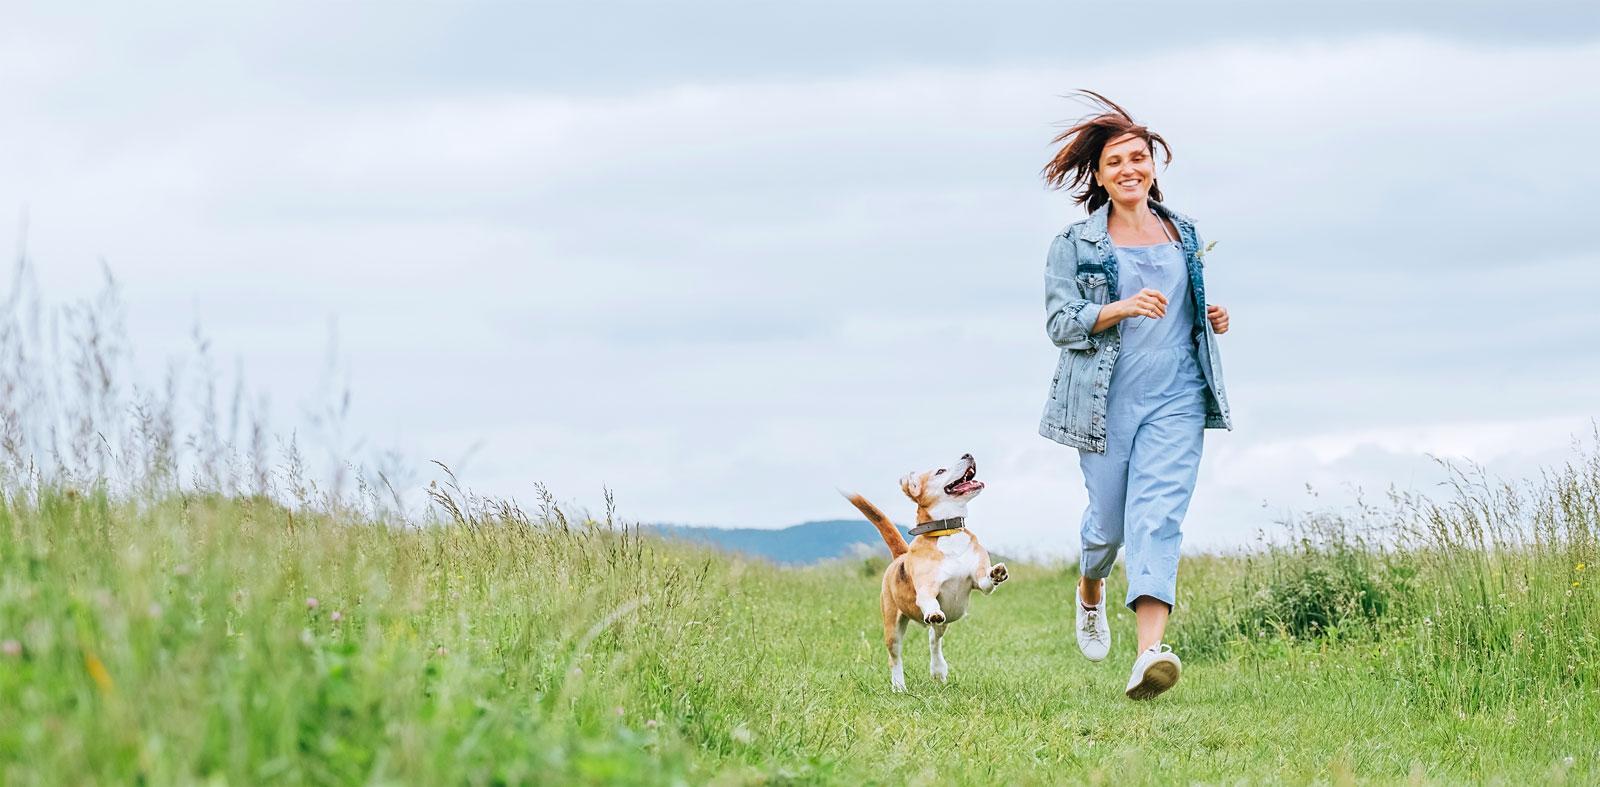 Pups_Endocannabinoid_System-_CBD_6_24_21